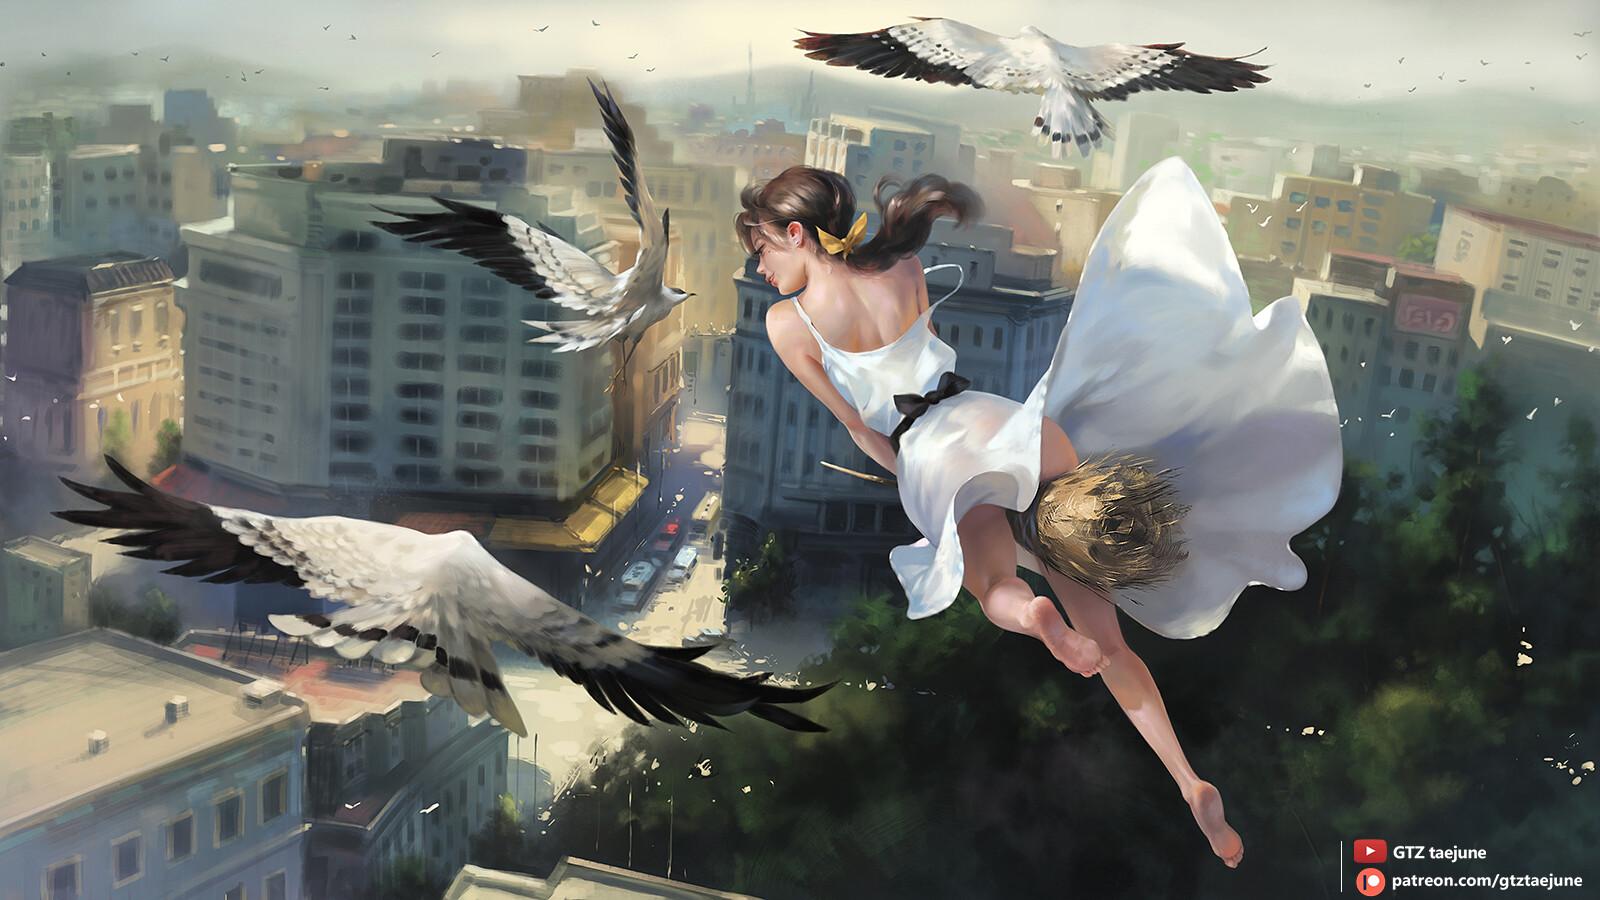 General 1600x900 ponytail fantasy girl dress white dress witch broom witches broom barefoot city birds fantasy art artwork drawing digital art illustration Taejune Kim foot sole